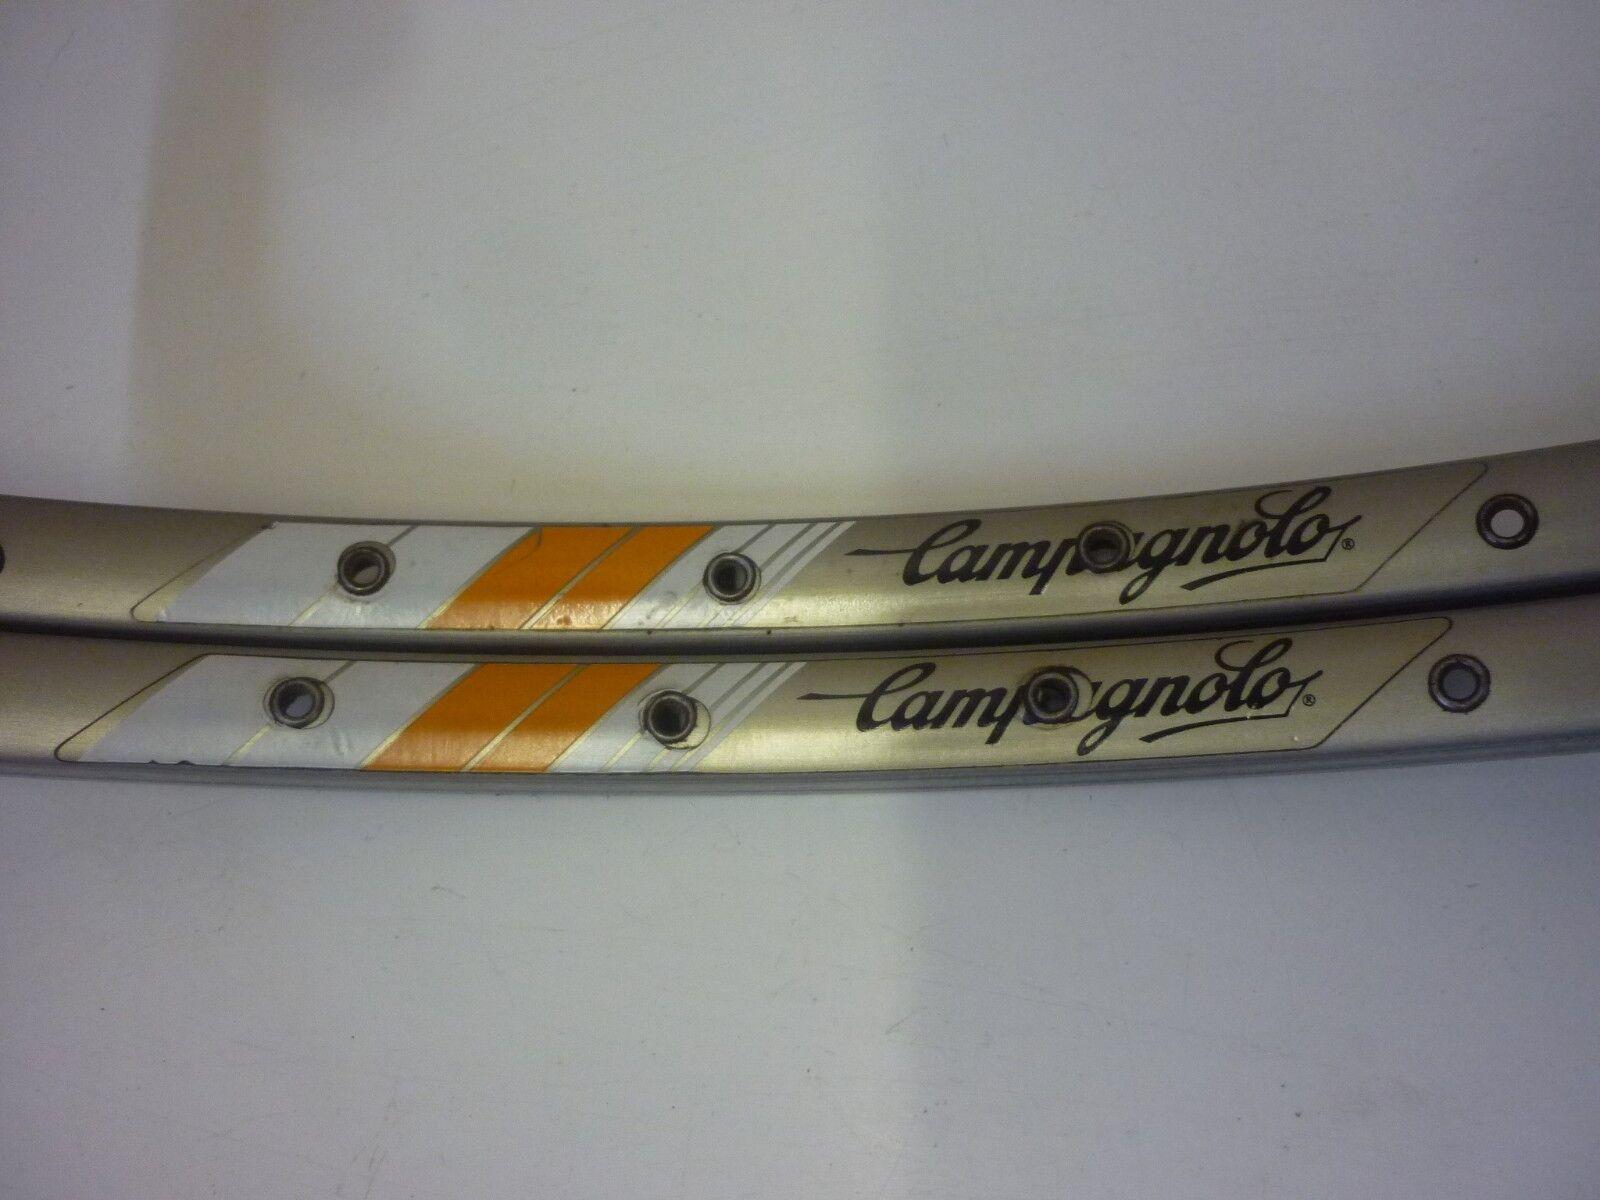 JANTES CAMPAGNOLO EPSILON STRADA G25 36H 36H 36H TUBULAR RIMS aa1844